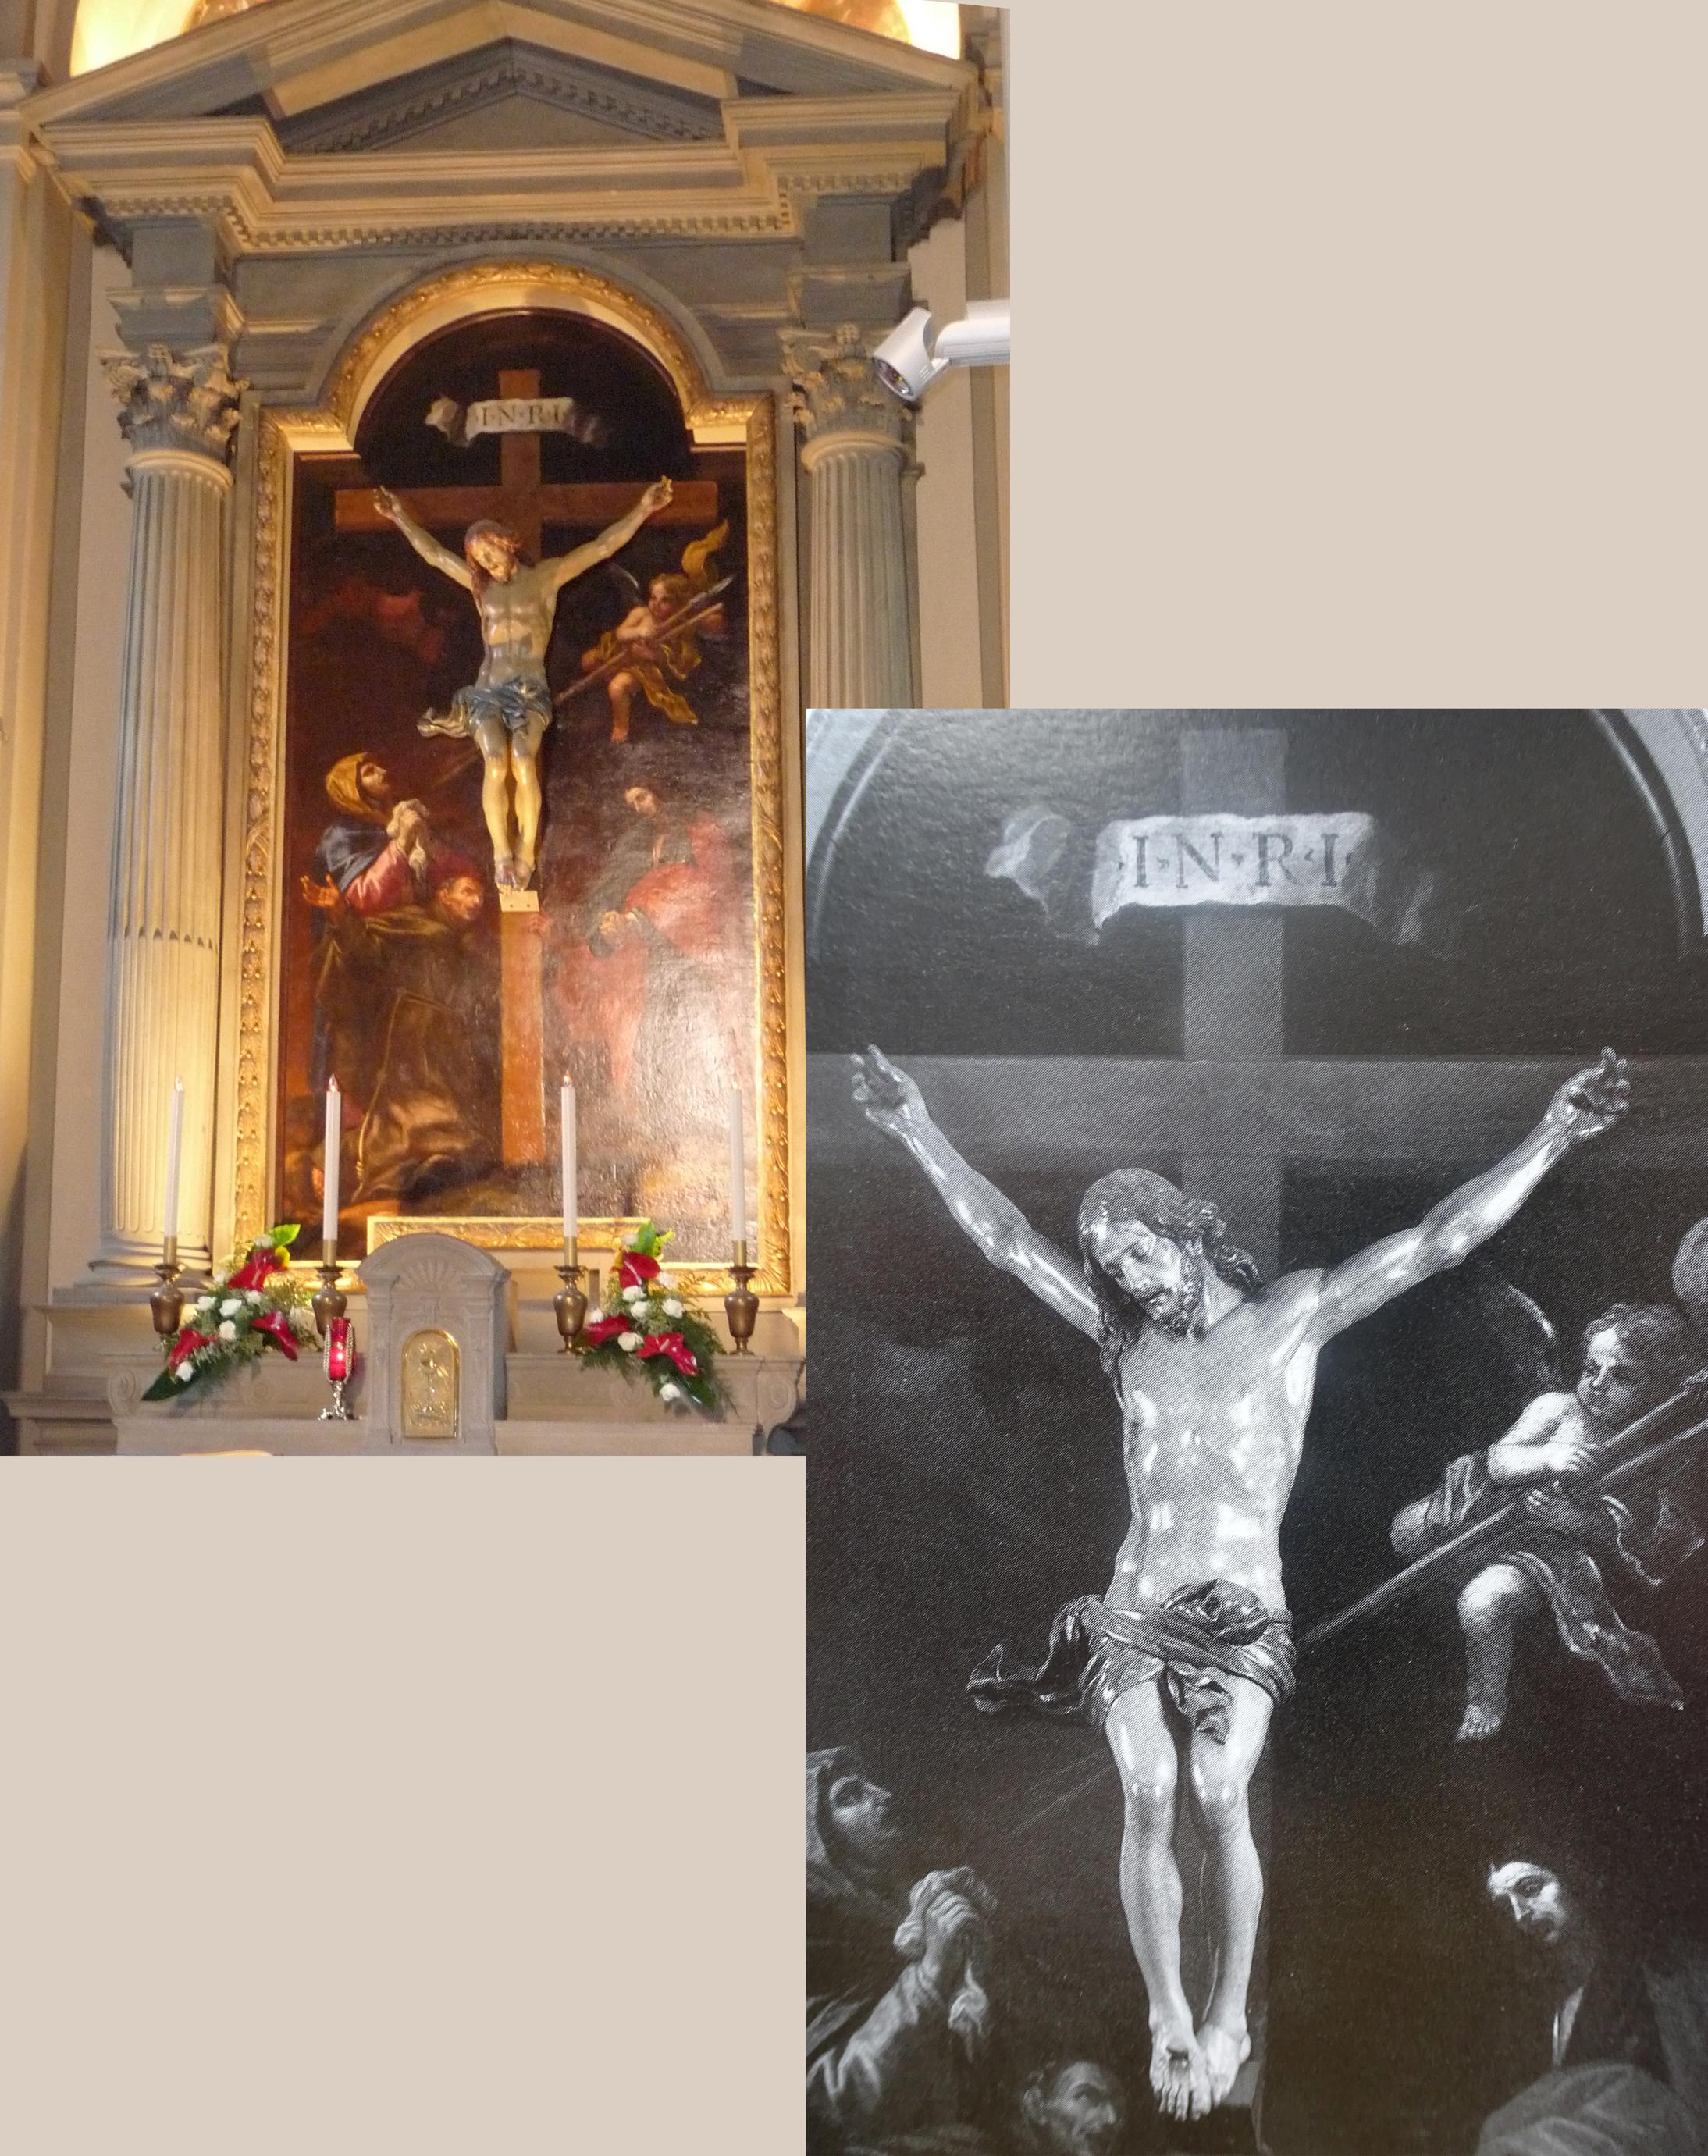 19C Volterrano & JM Foggini Virgin St John Evangelist & Pietro dAlcantara Chiesa dei SS Quirico Lucia & Pietro d'Alcantara 2